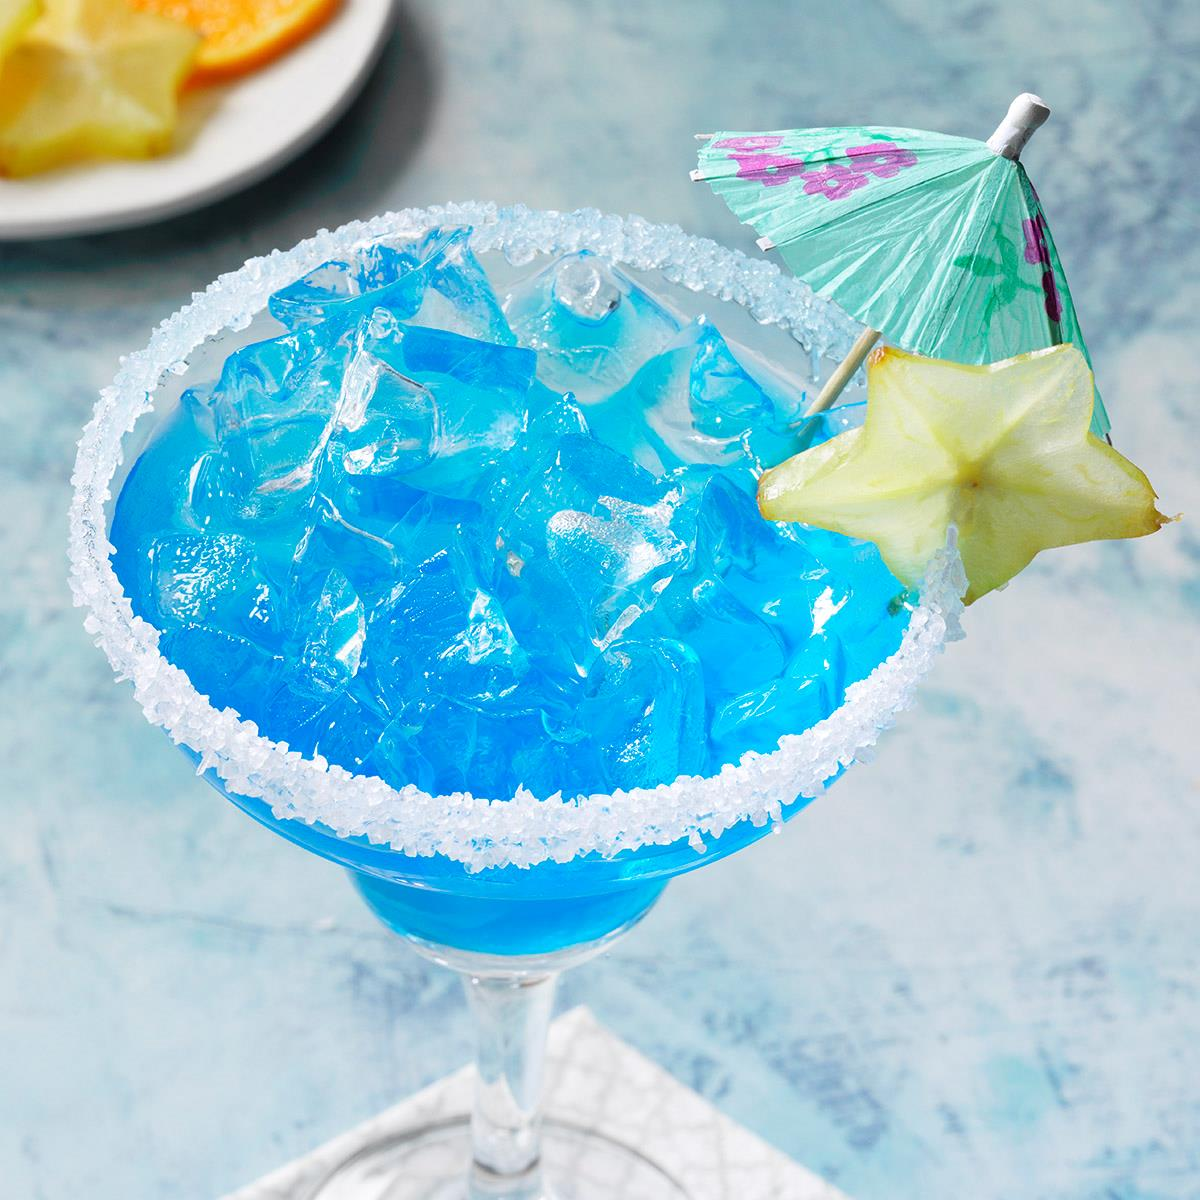 Caribbean Blue Margarita